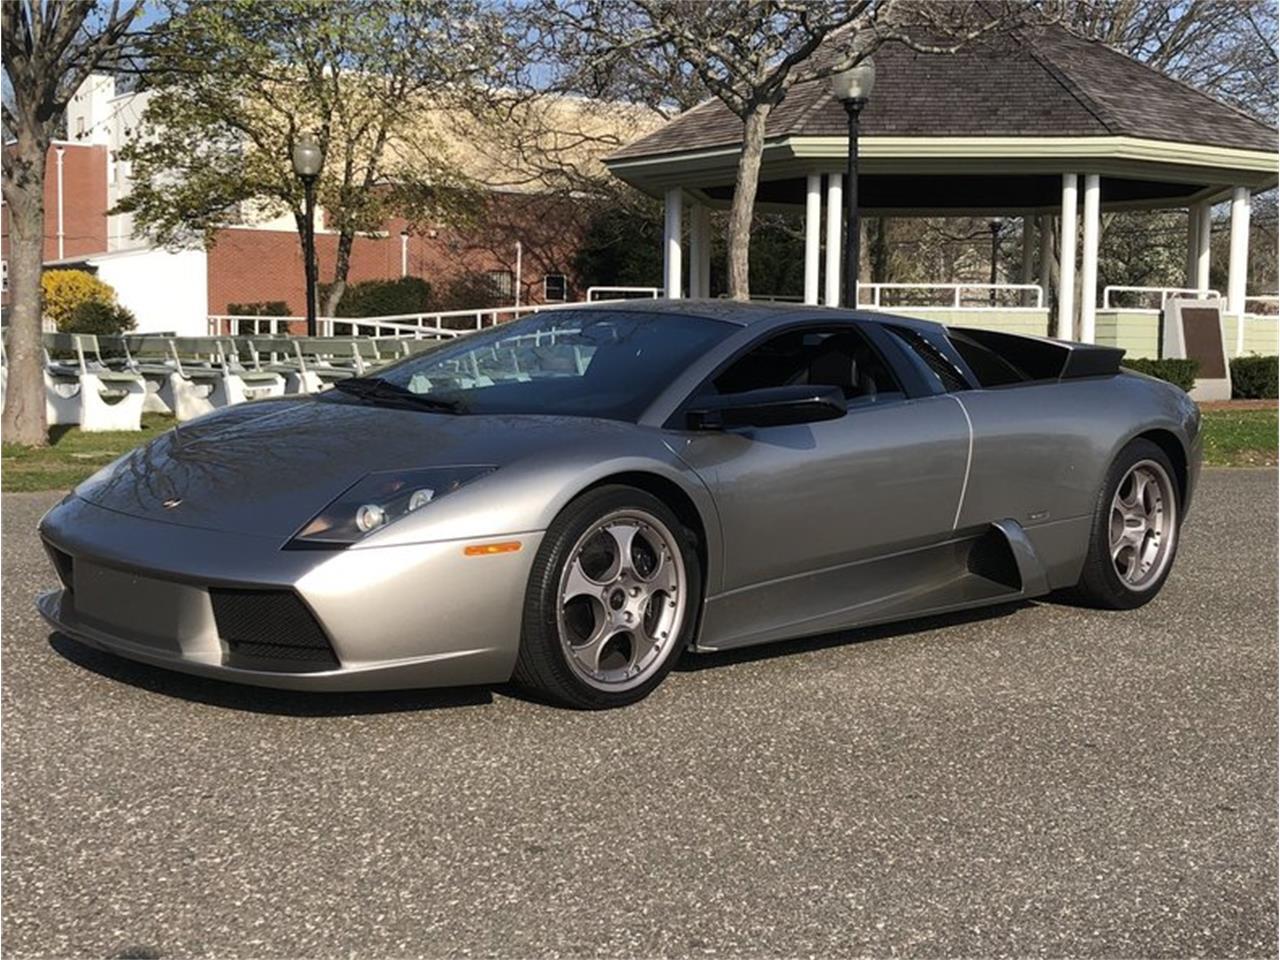 2003 Lamborghini Murcielago For Sale Classiccars Com Cc 1088039